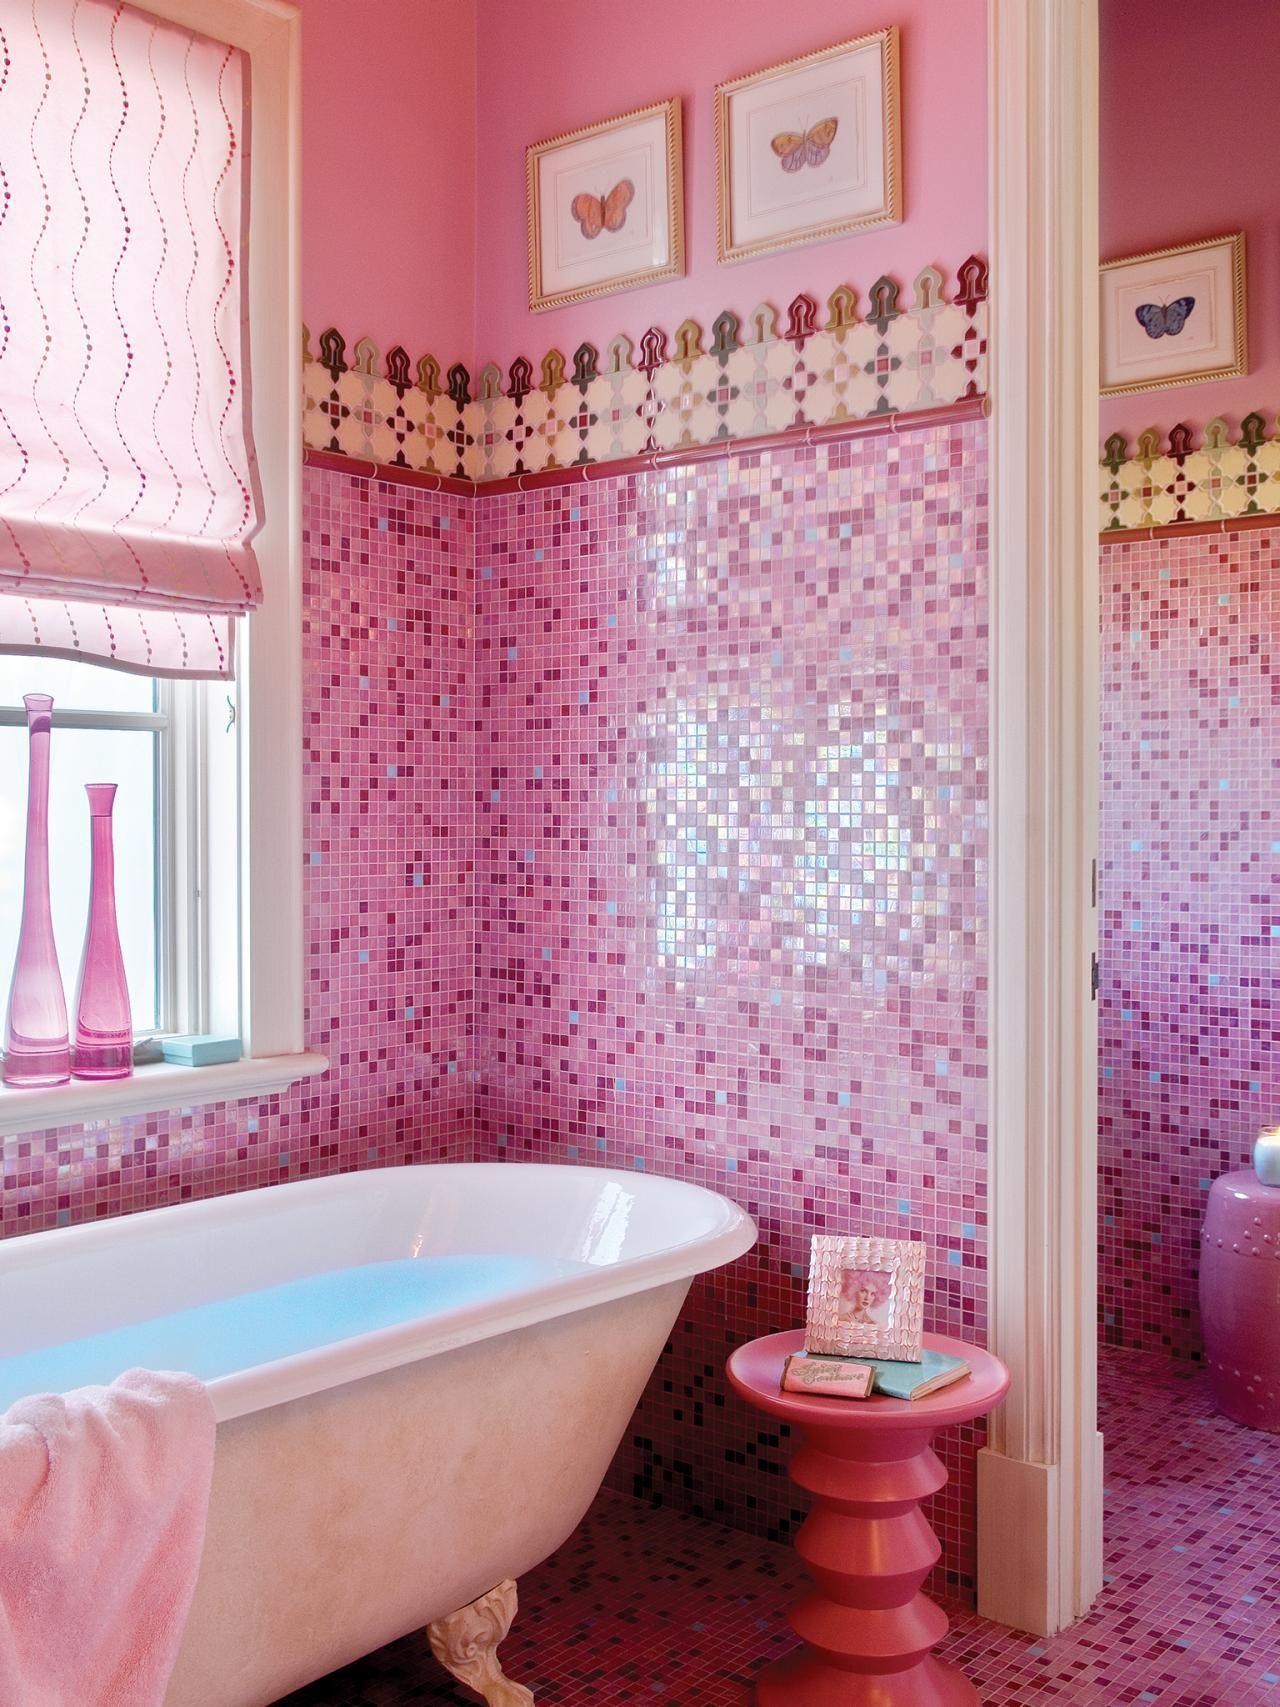 Delightful 99 Stylish Bathroom Design Ideas Youu0027ll Love Idea